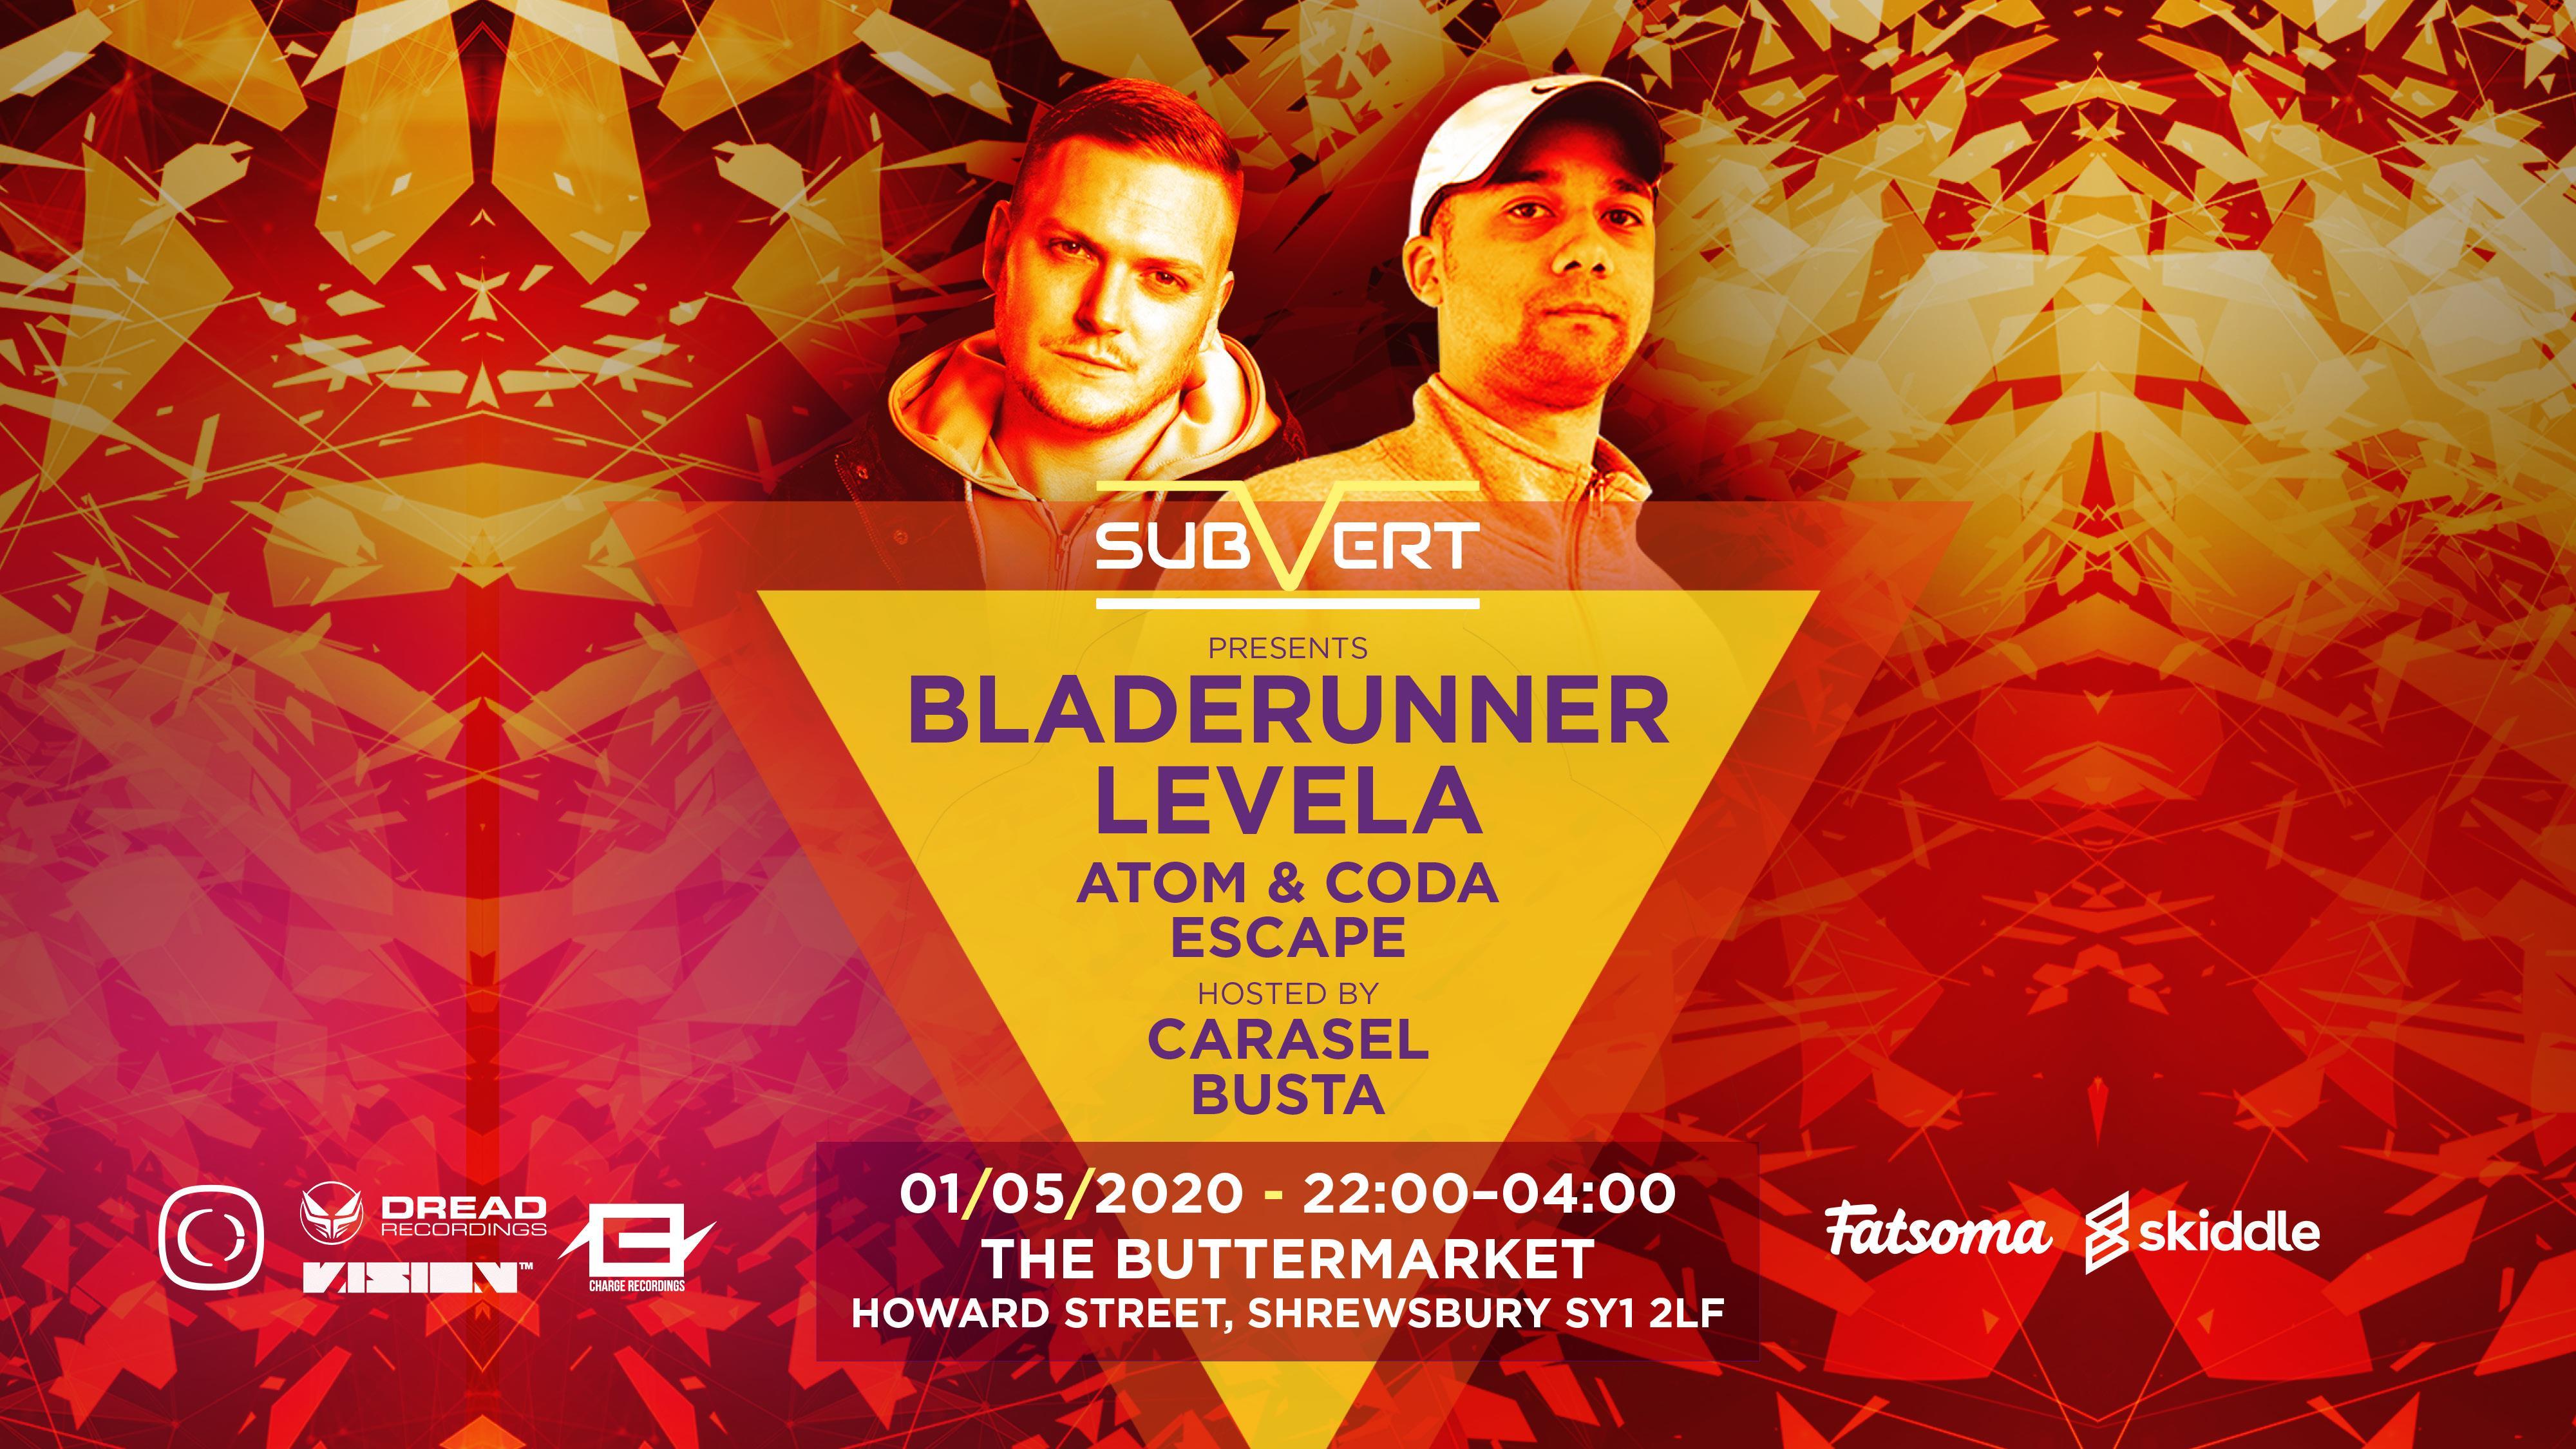 Subvert Presents Bladerunner & Levela